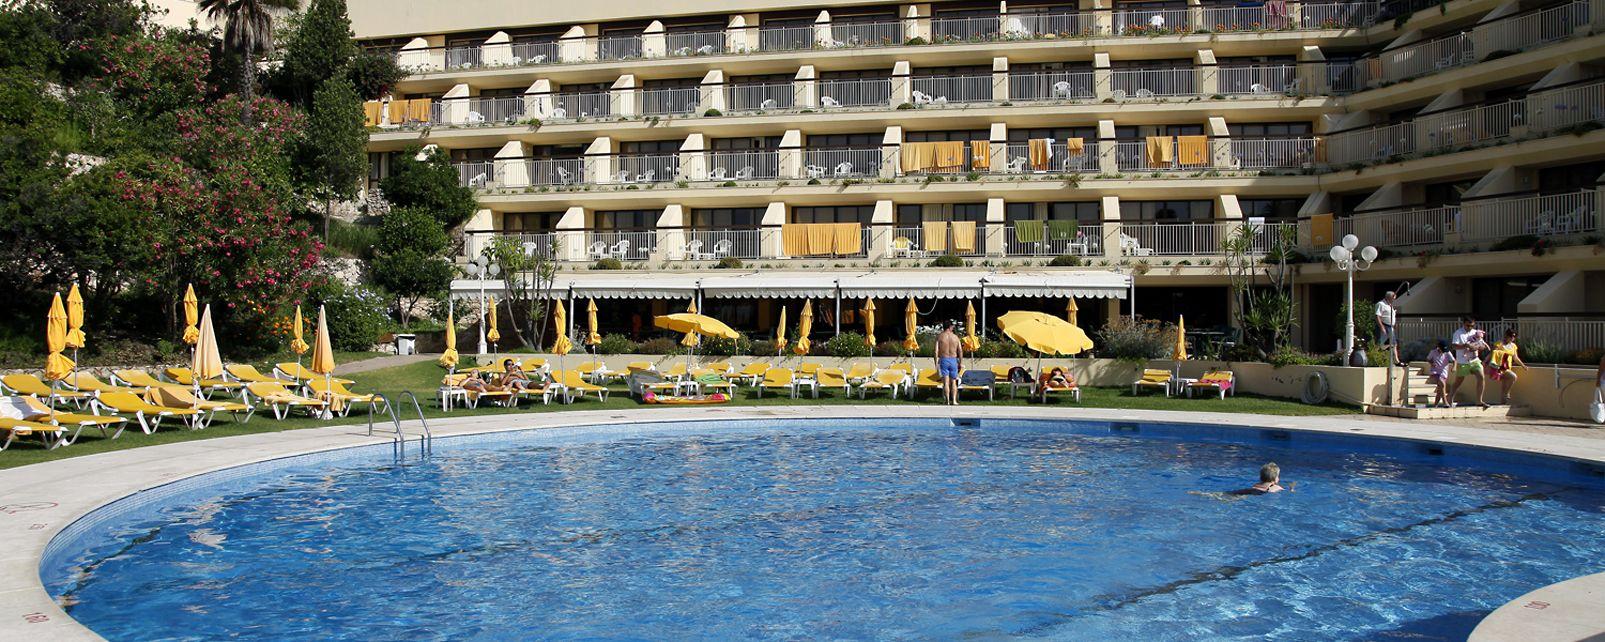 Hotel Tivoli Almansor